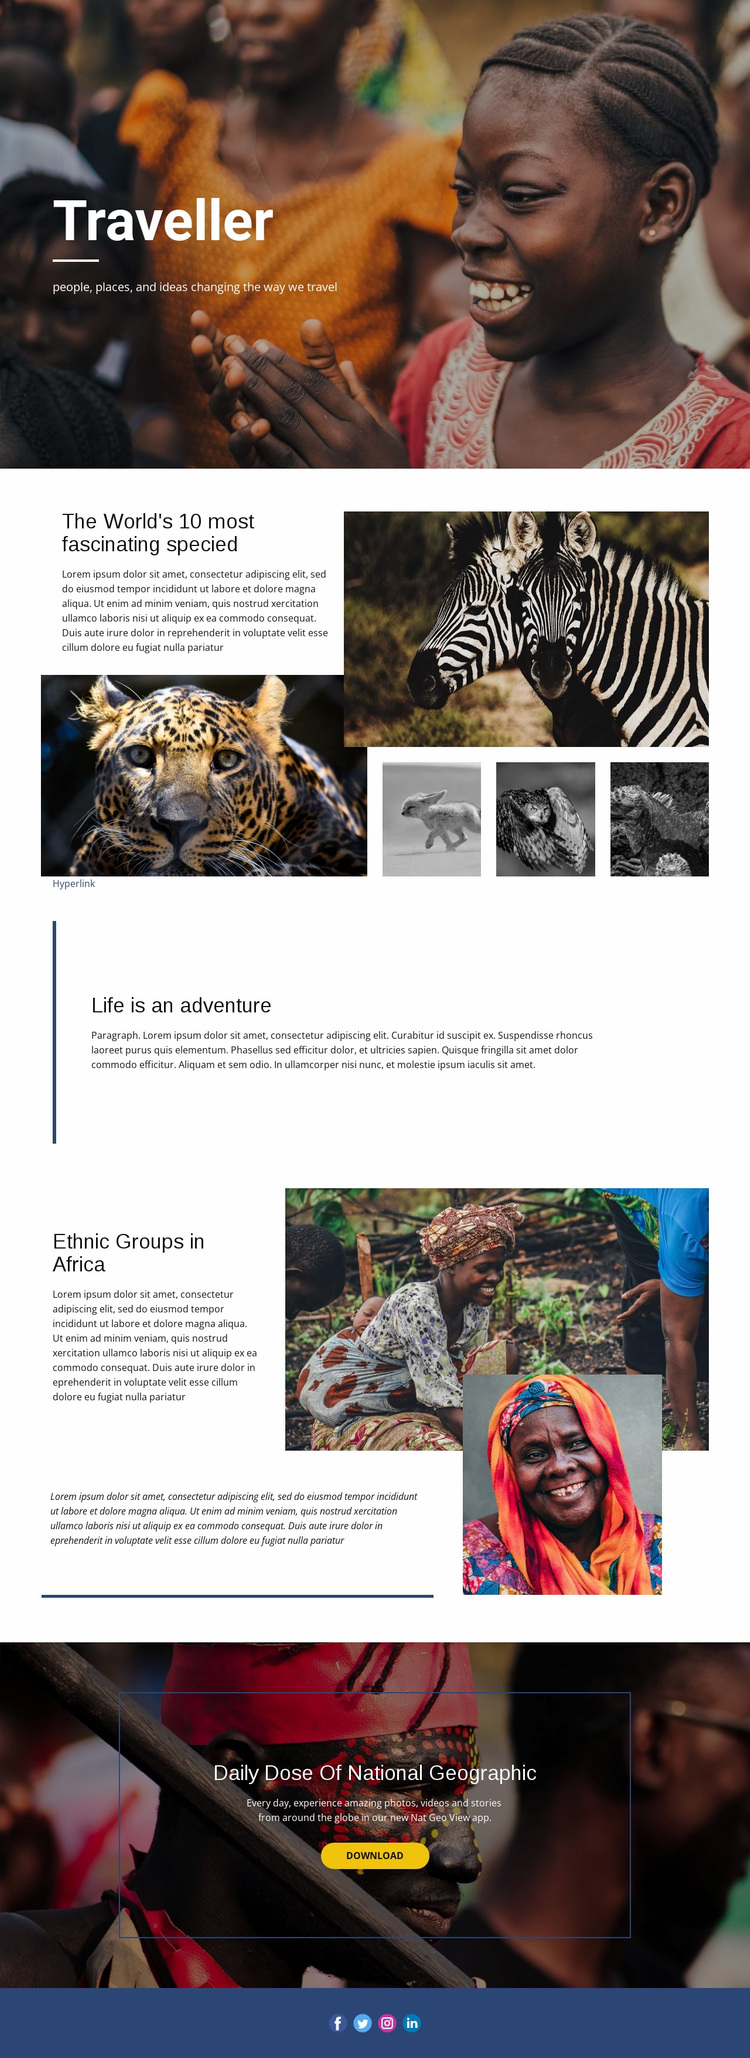 Life is an adventure Website Design